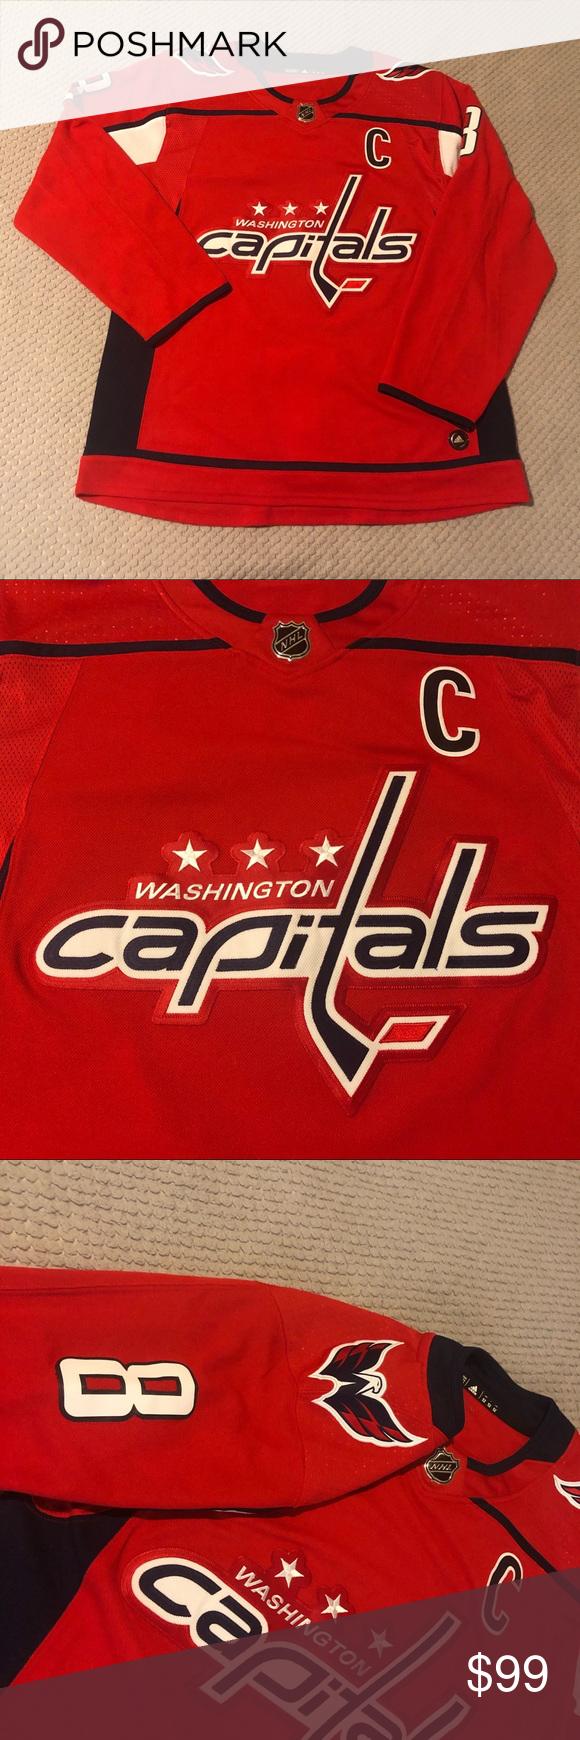 Alexander Ovechkin Washington Capitals Nhl Jersey Vintage Nike Red Adidas Nhl Jerseys